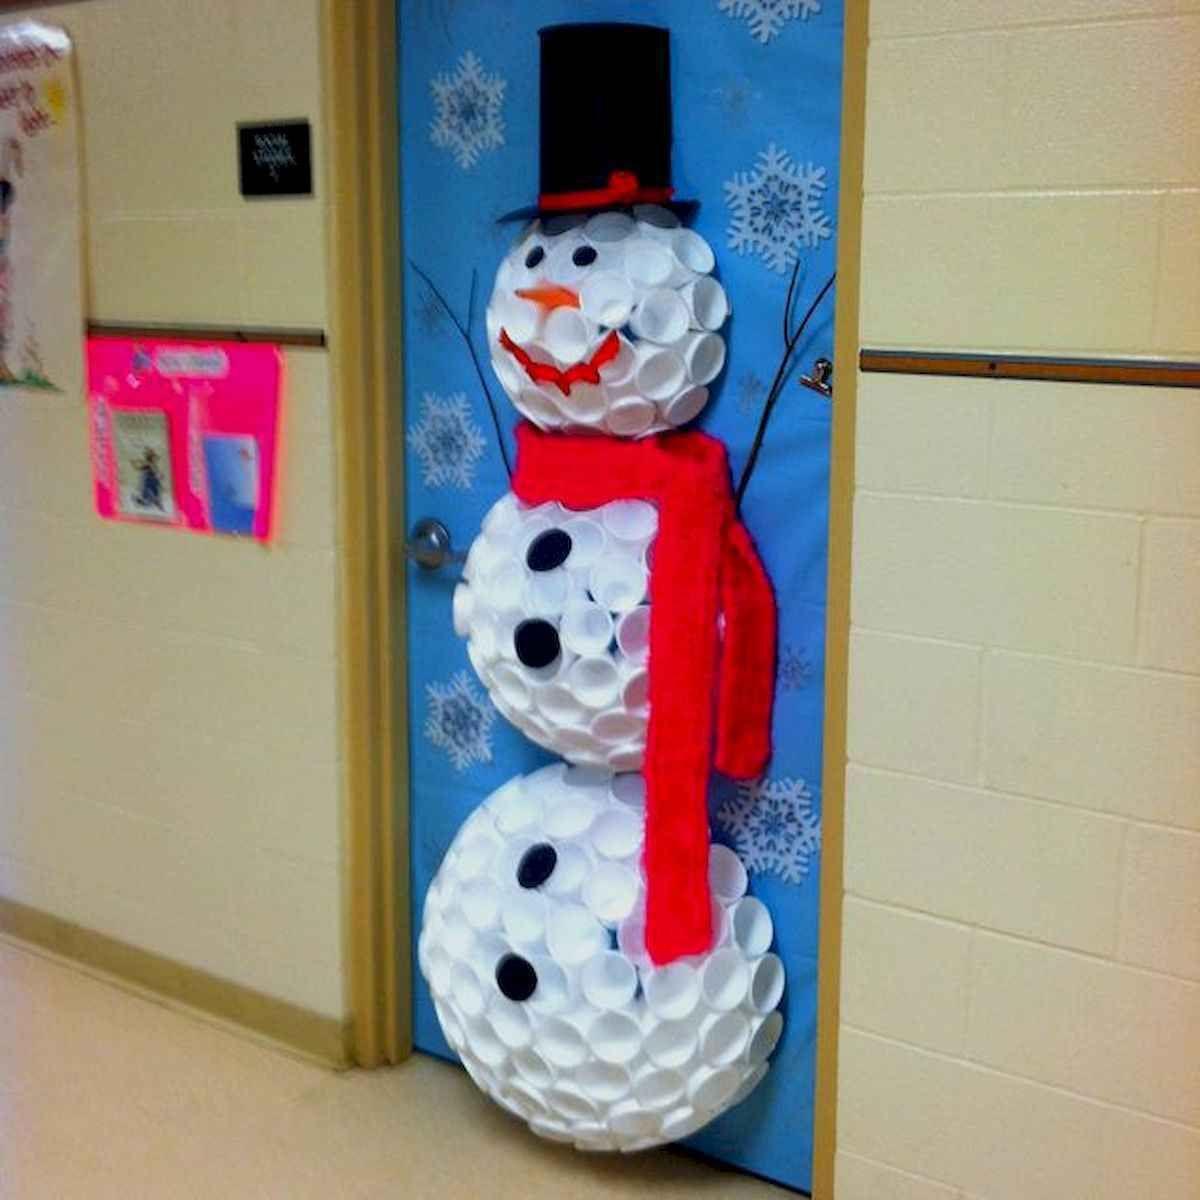 40 Creative DIY Christmas Door Decorations For Home And School (1) - LivingMarch.com #christmasdoordecorationsforschool